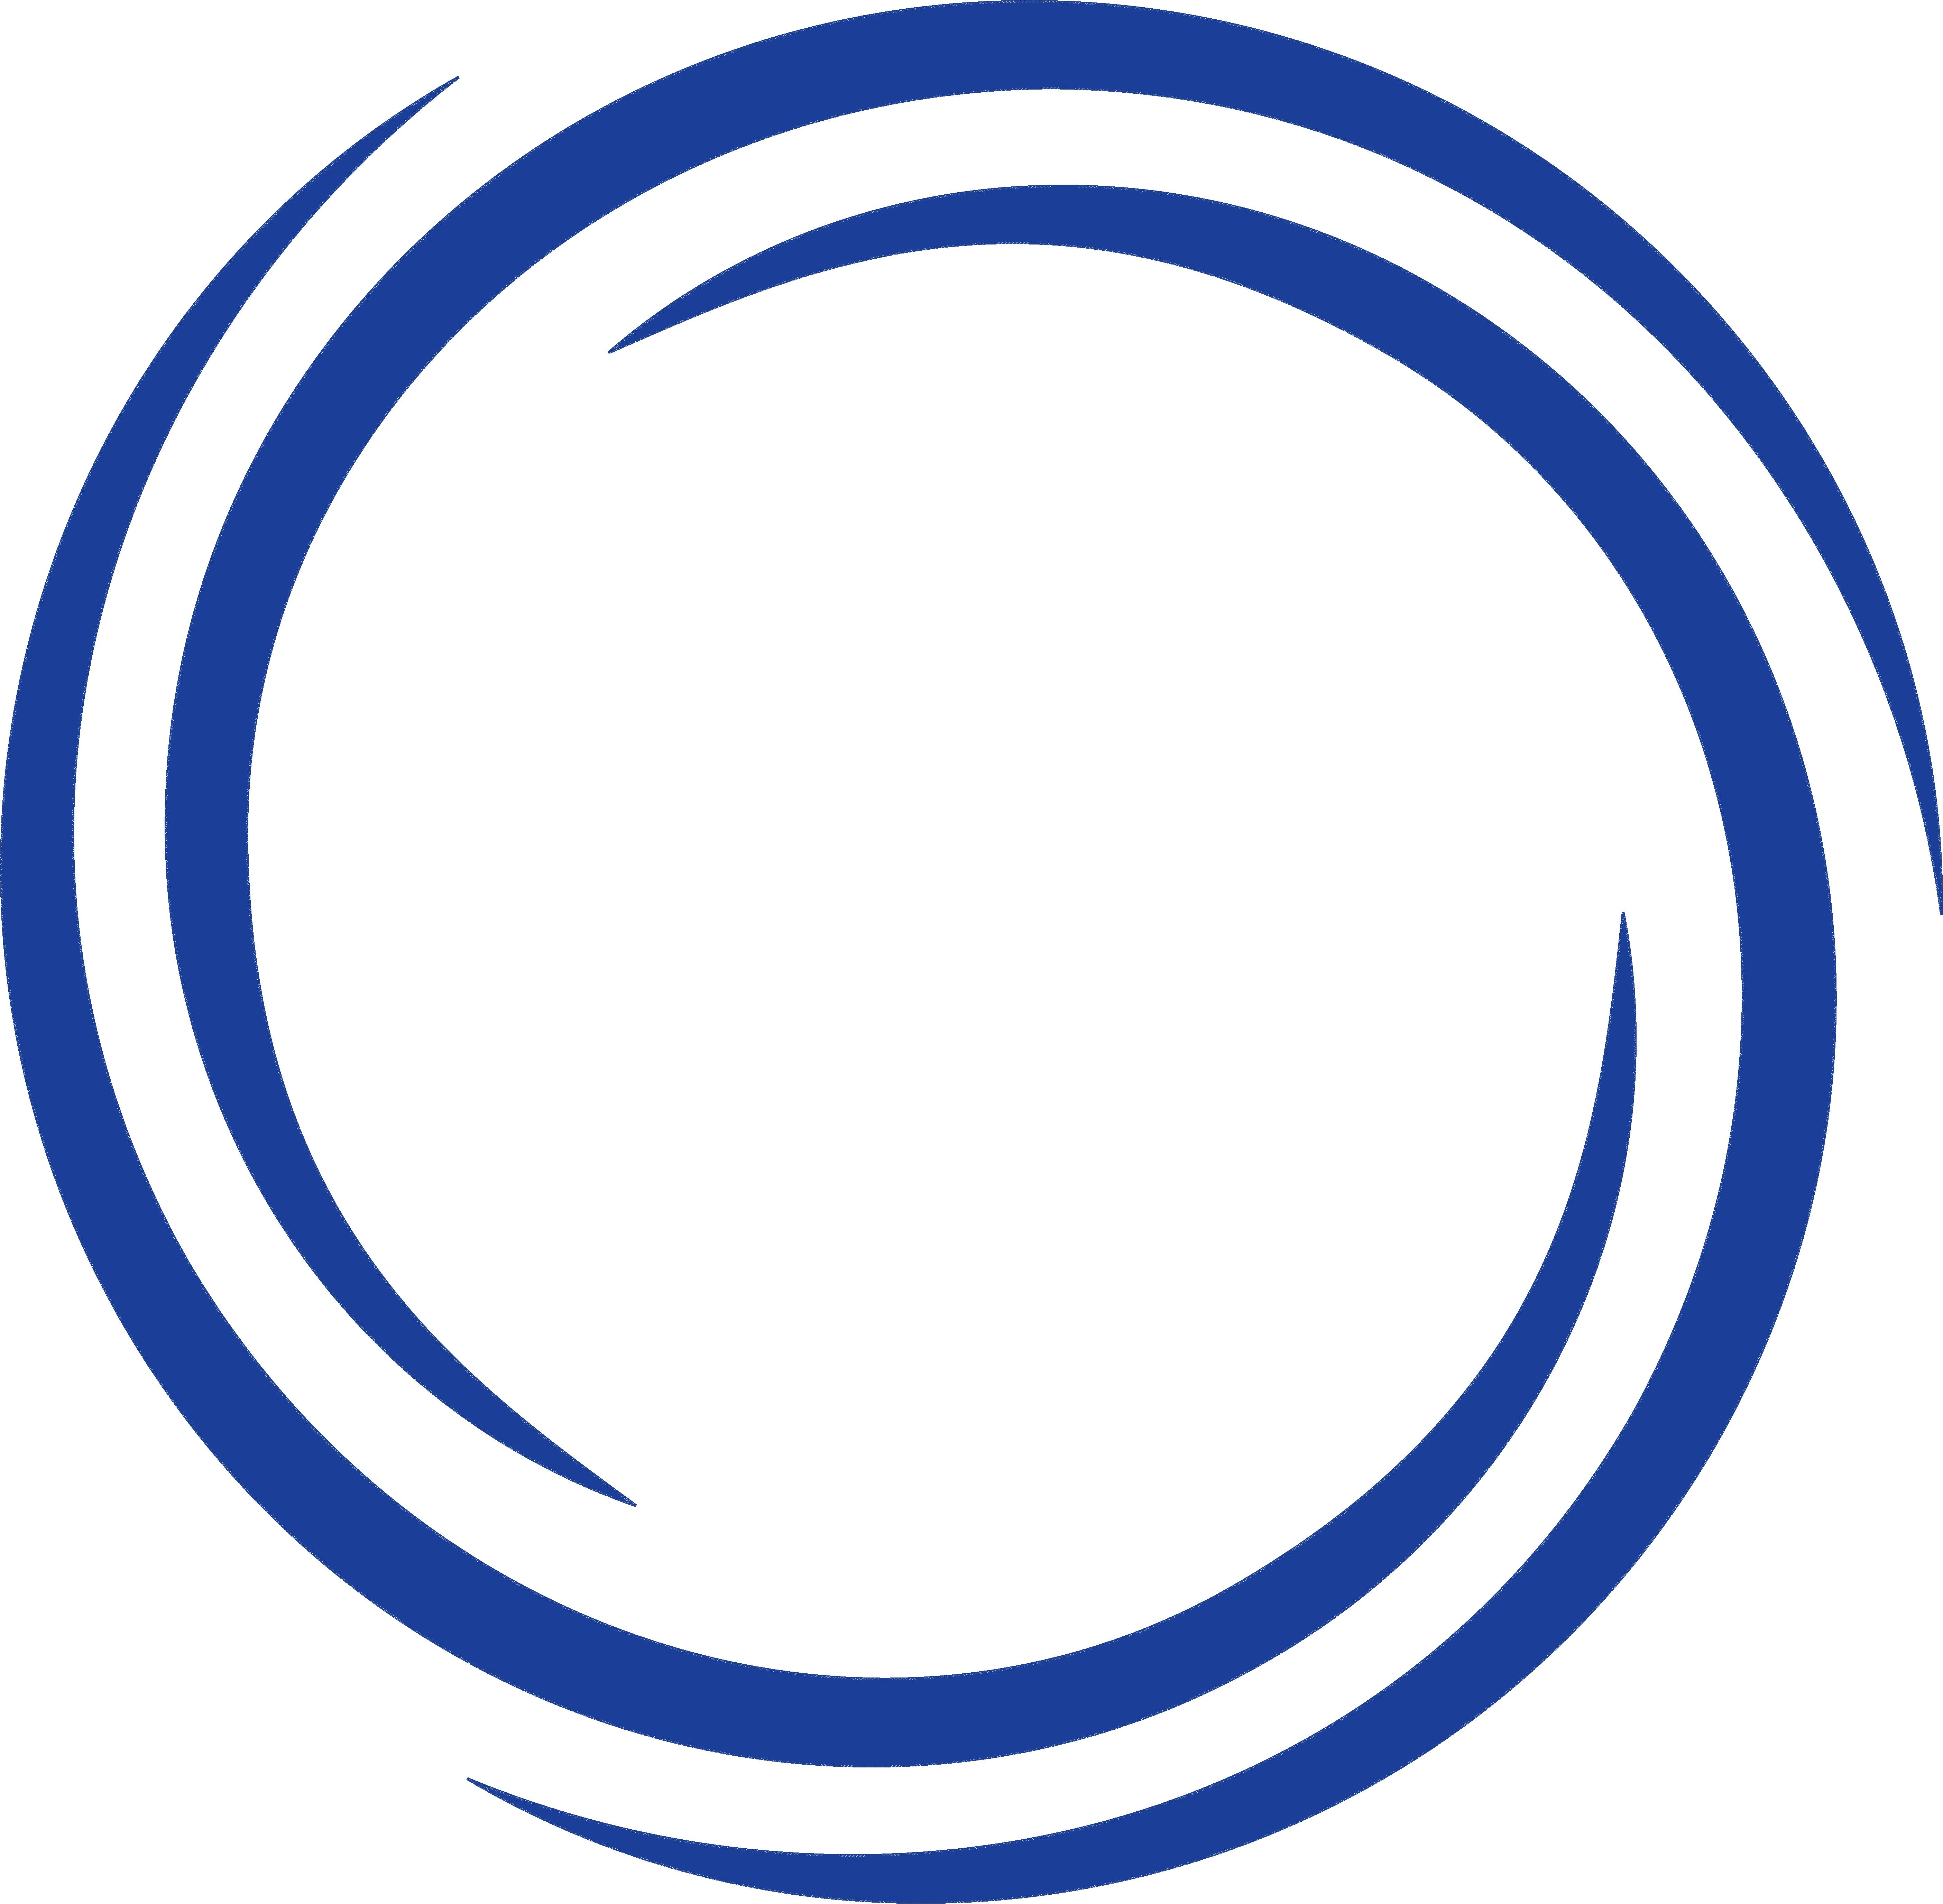 Logo templates png 8 » PNG Image.